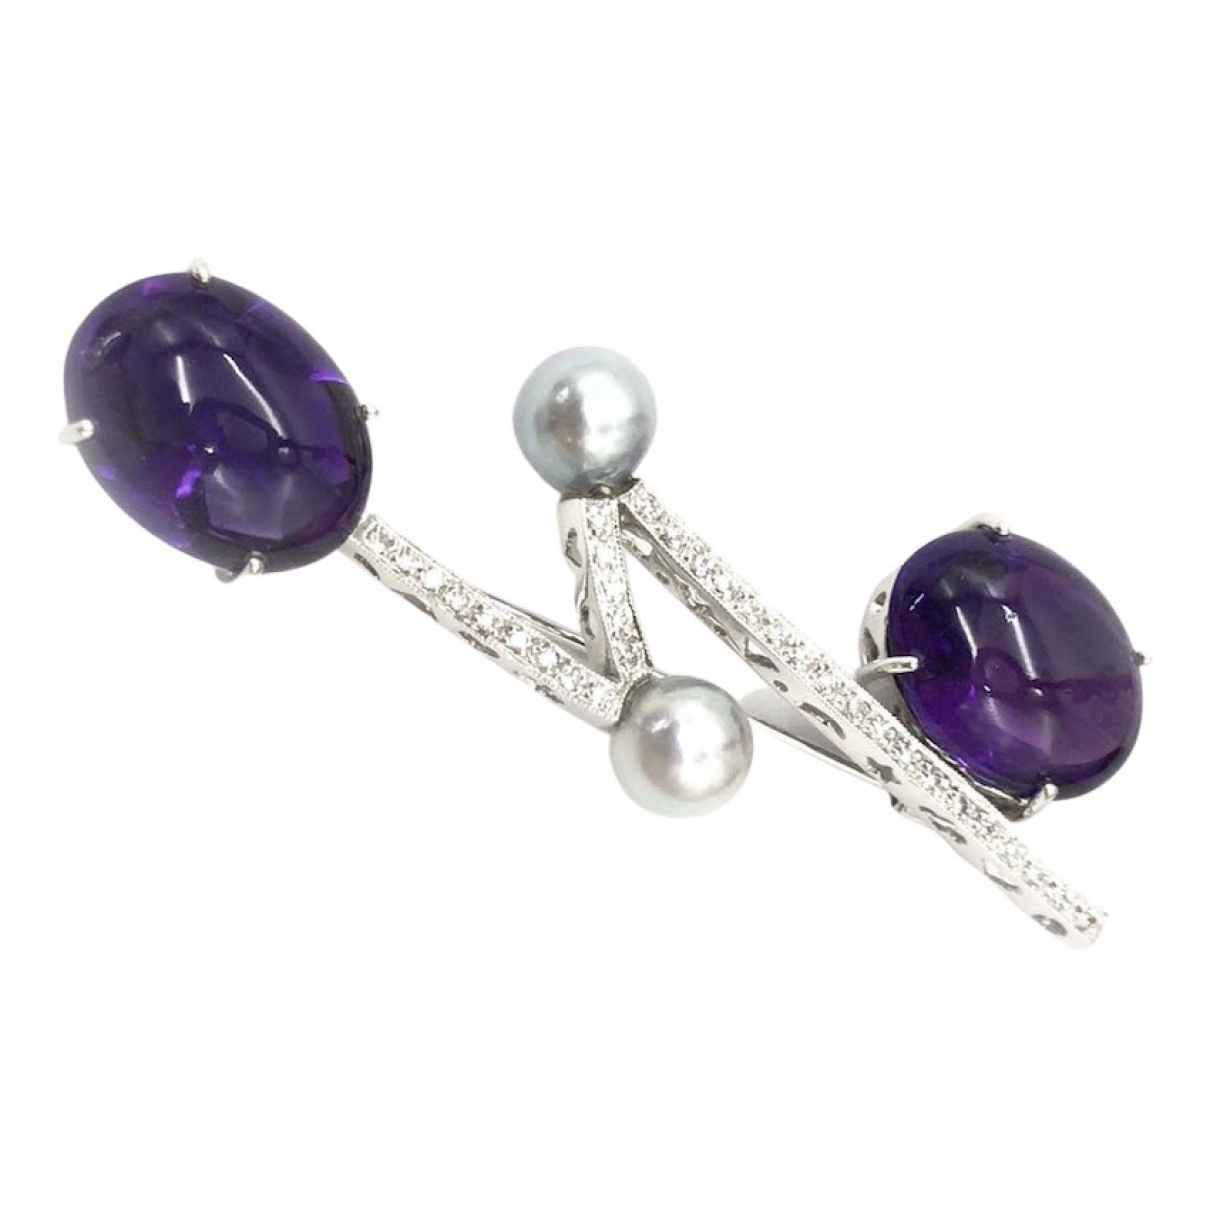 - Broche Amethyste pour femme en or blanc - violet